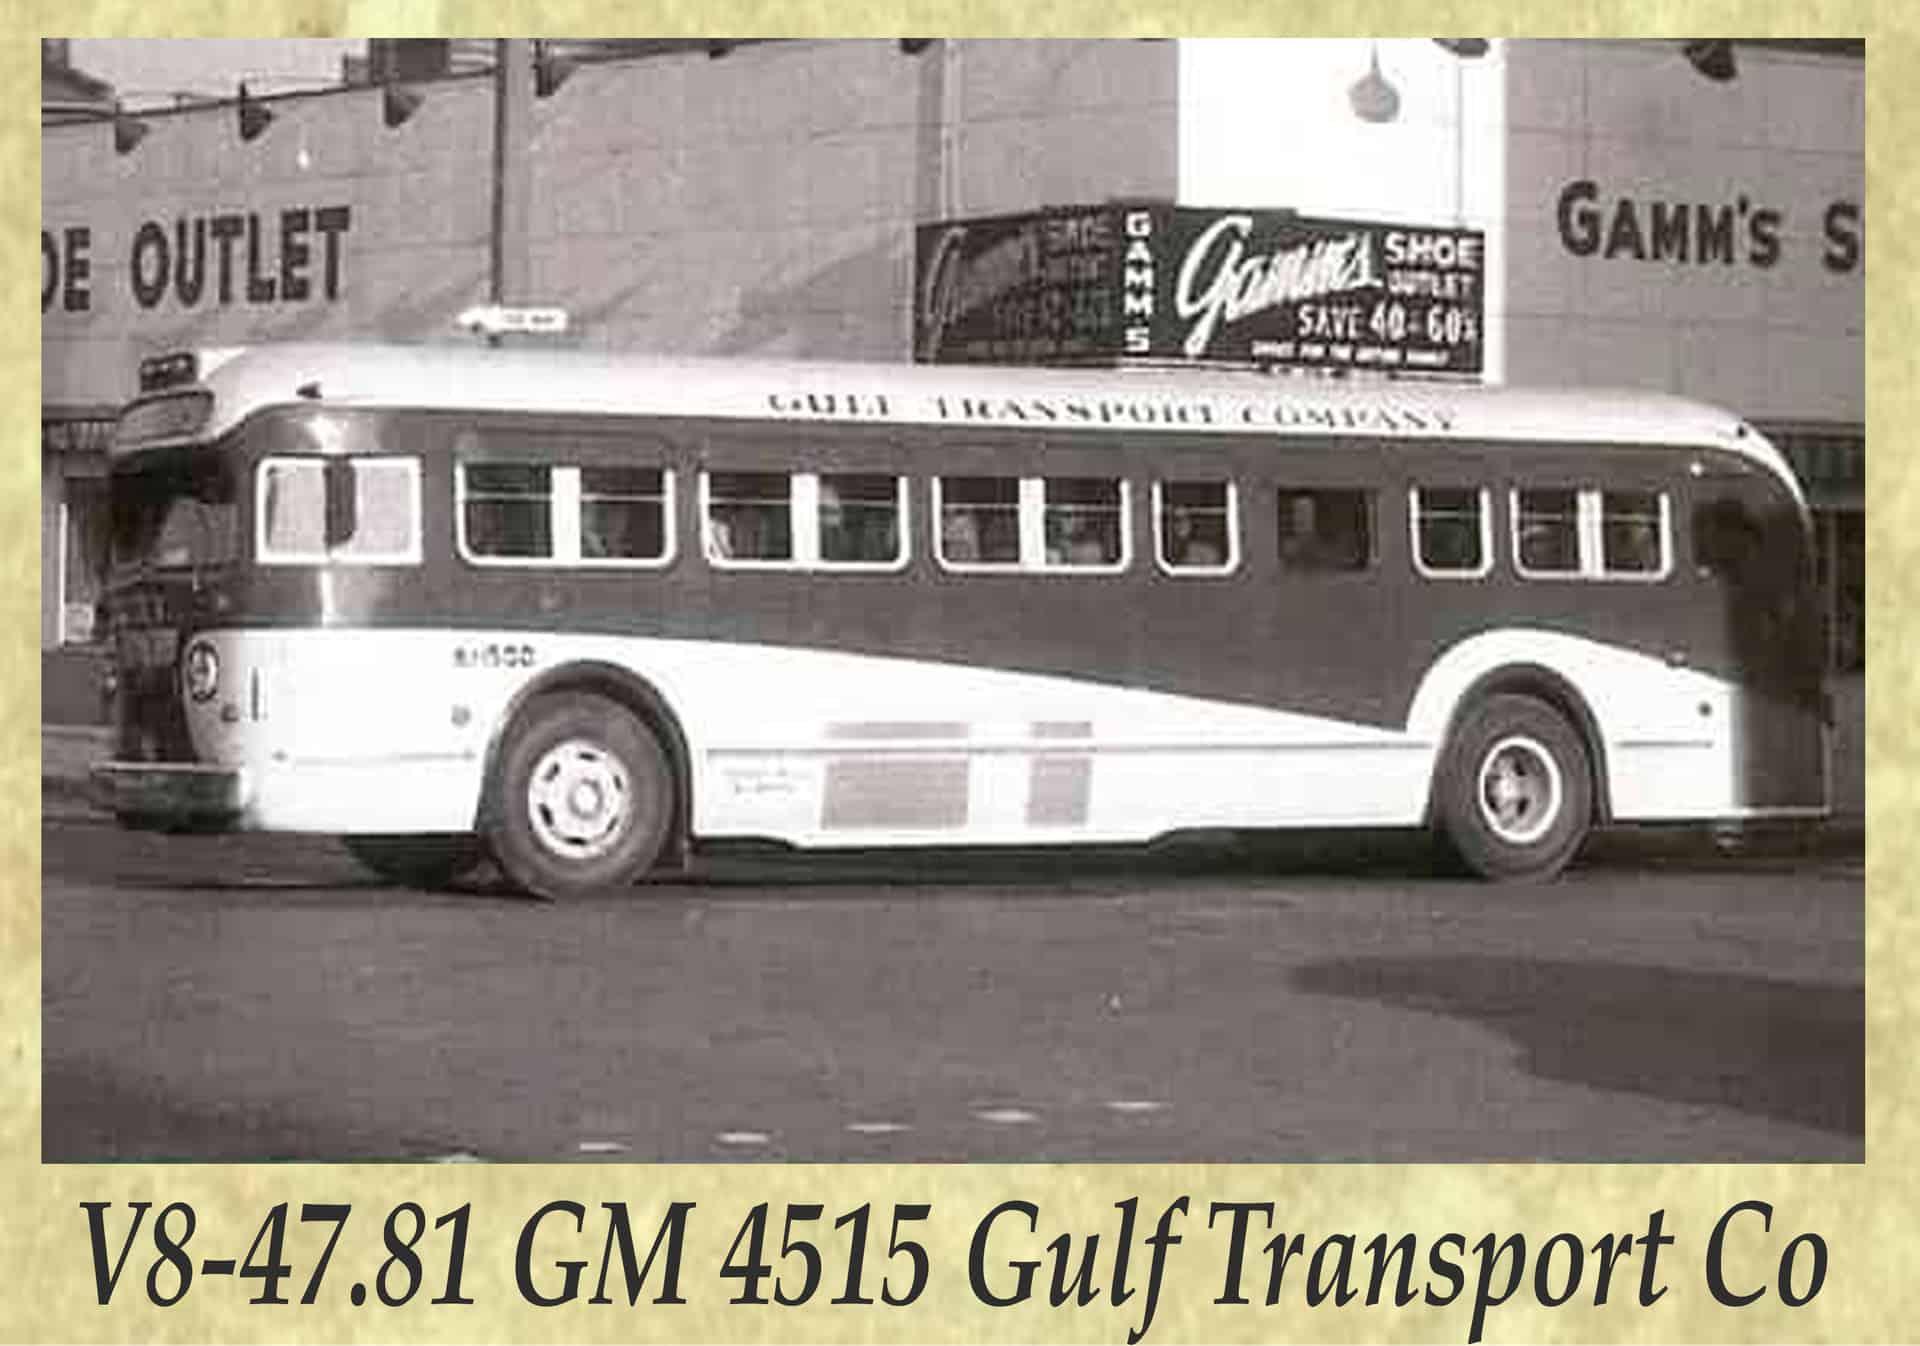 V8-47.81 GM 4515 Gulf Transport Co